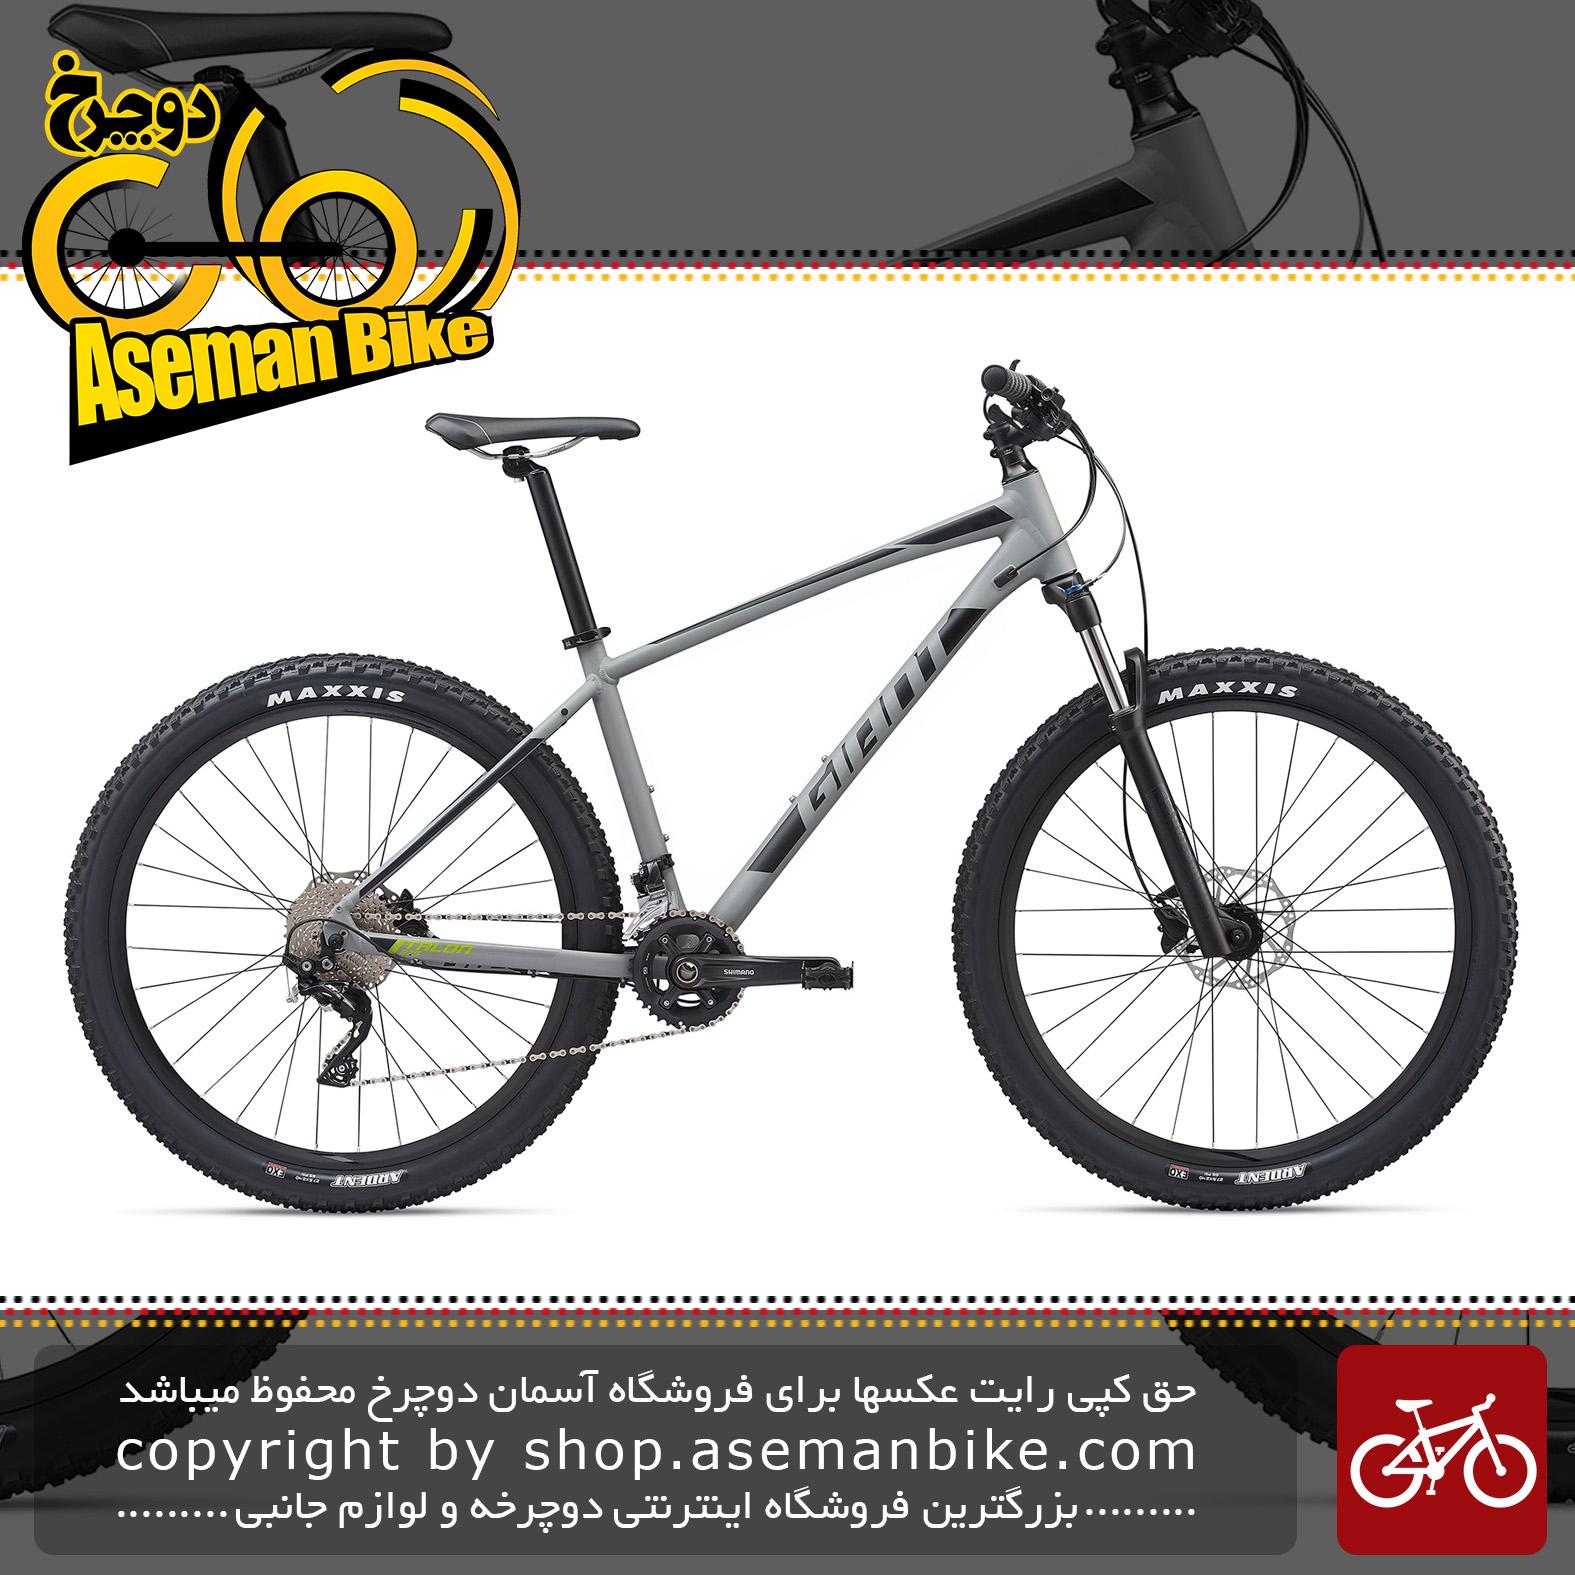 دوچرخه کوهستان جاینت مدل تالون 1 (جی ای) 2020 Giant Mountain Bicycle Talon 1 (GE) 2020